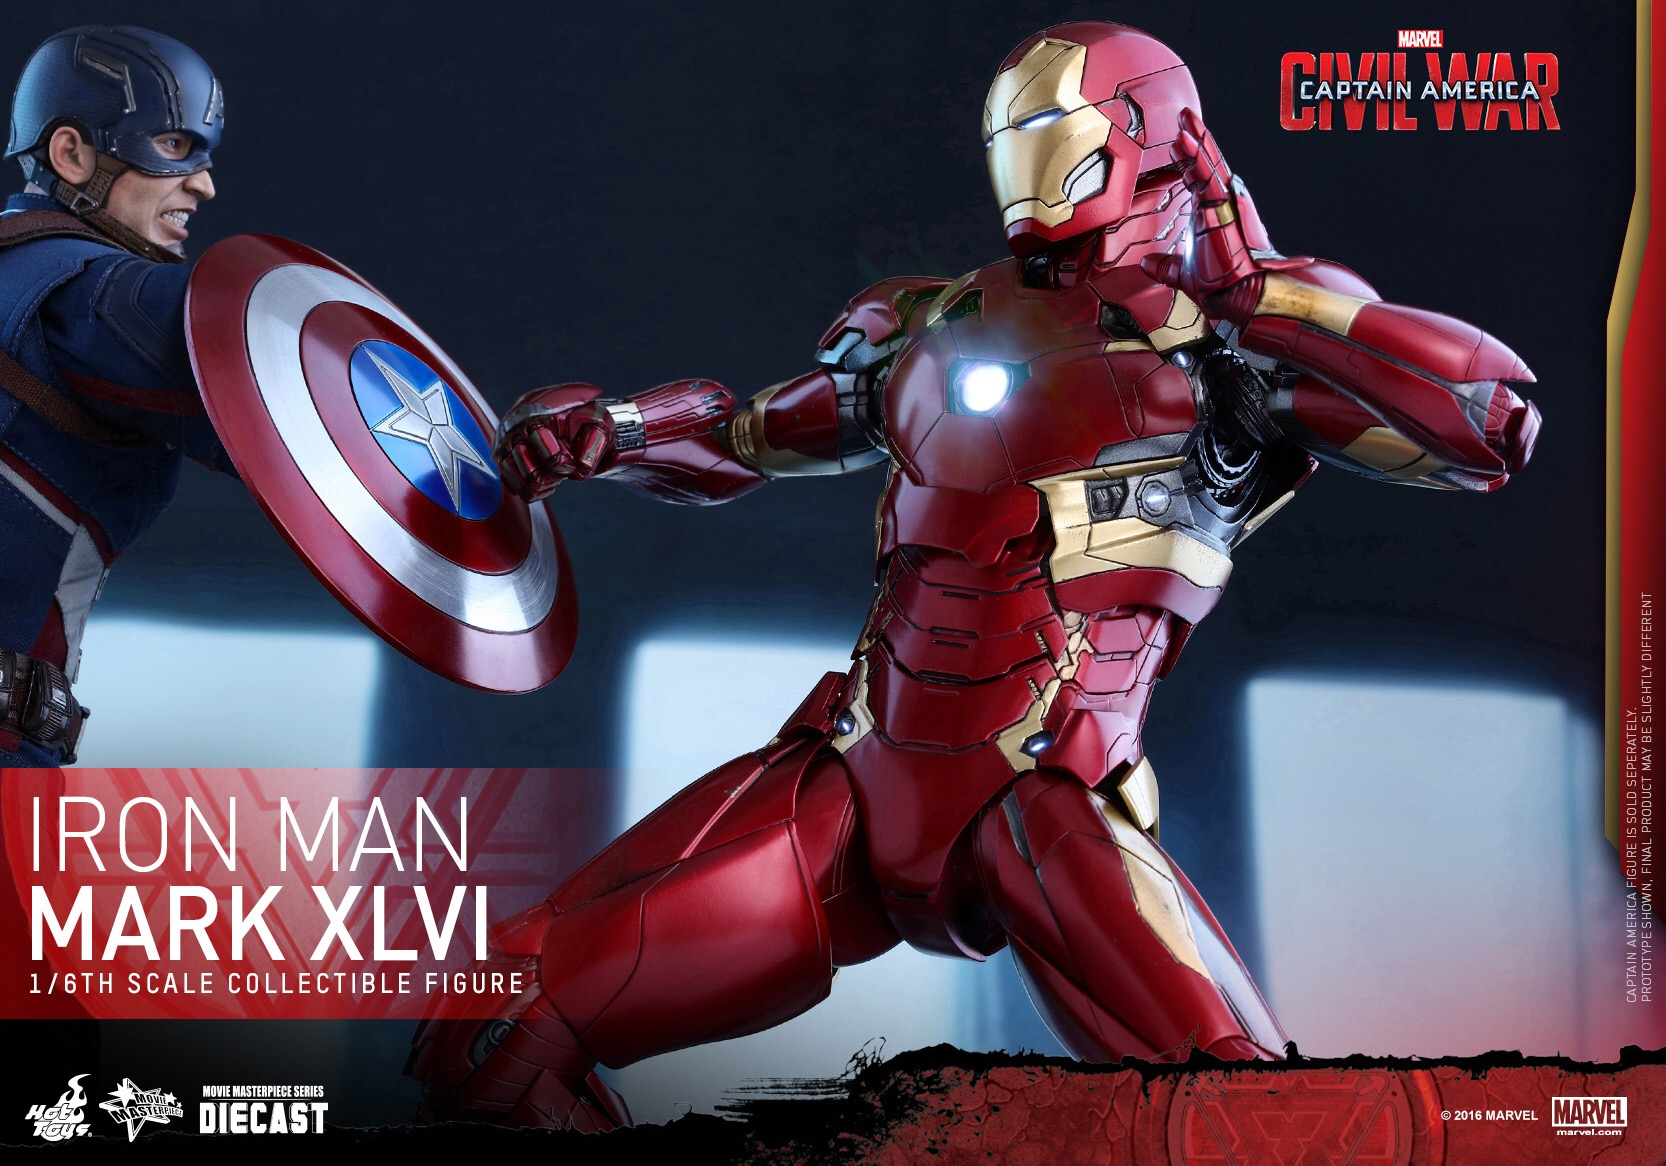 CAPTAIN AMERICA : CIVIL WAR - IRON MAN MARK XLVI (MMS353DC16) 160420020855291778